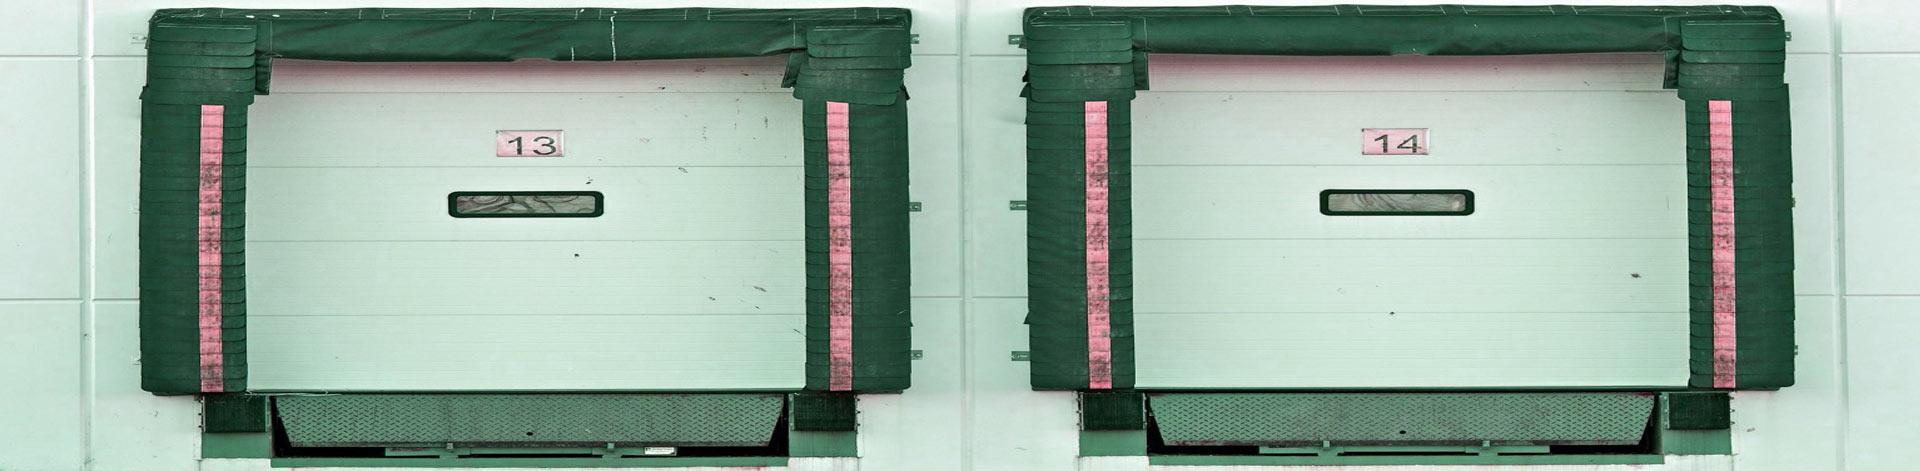 About garage door repair brooklyn brooklyn ny garage residential brooklyn rubansaba